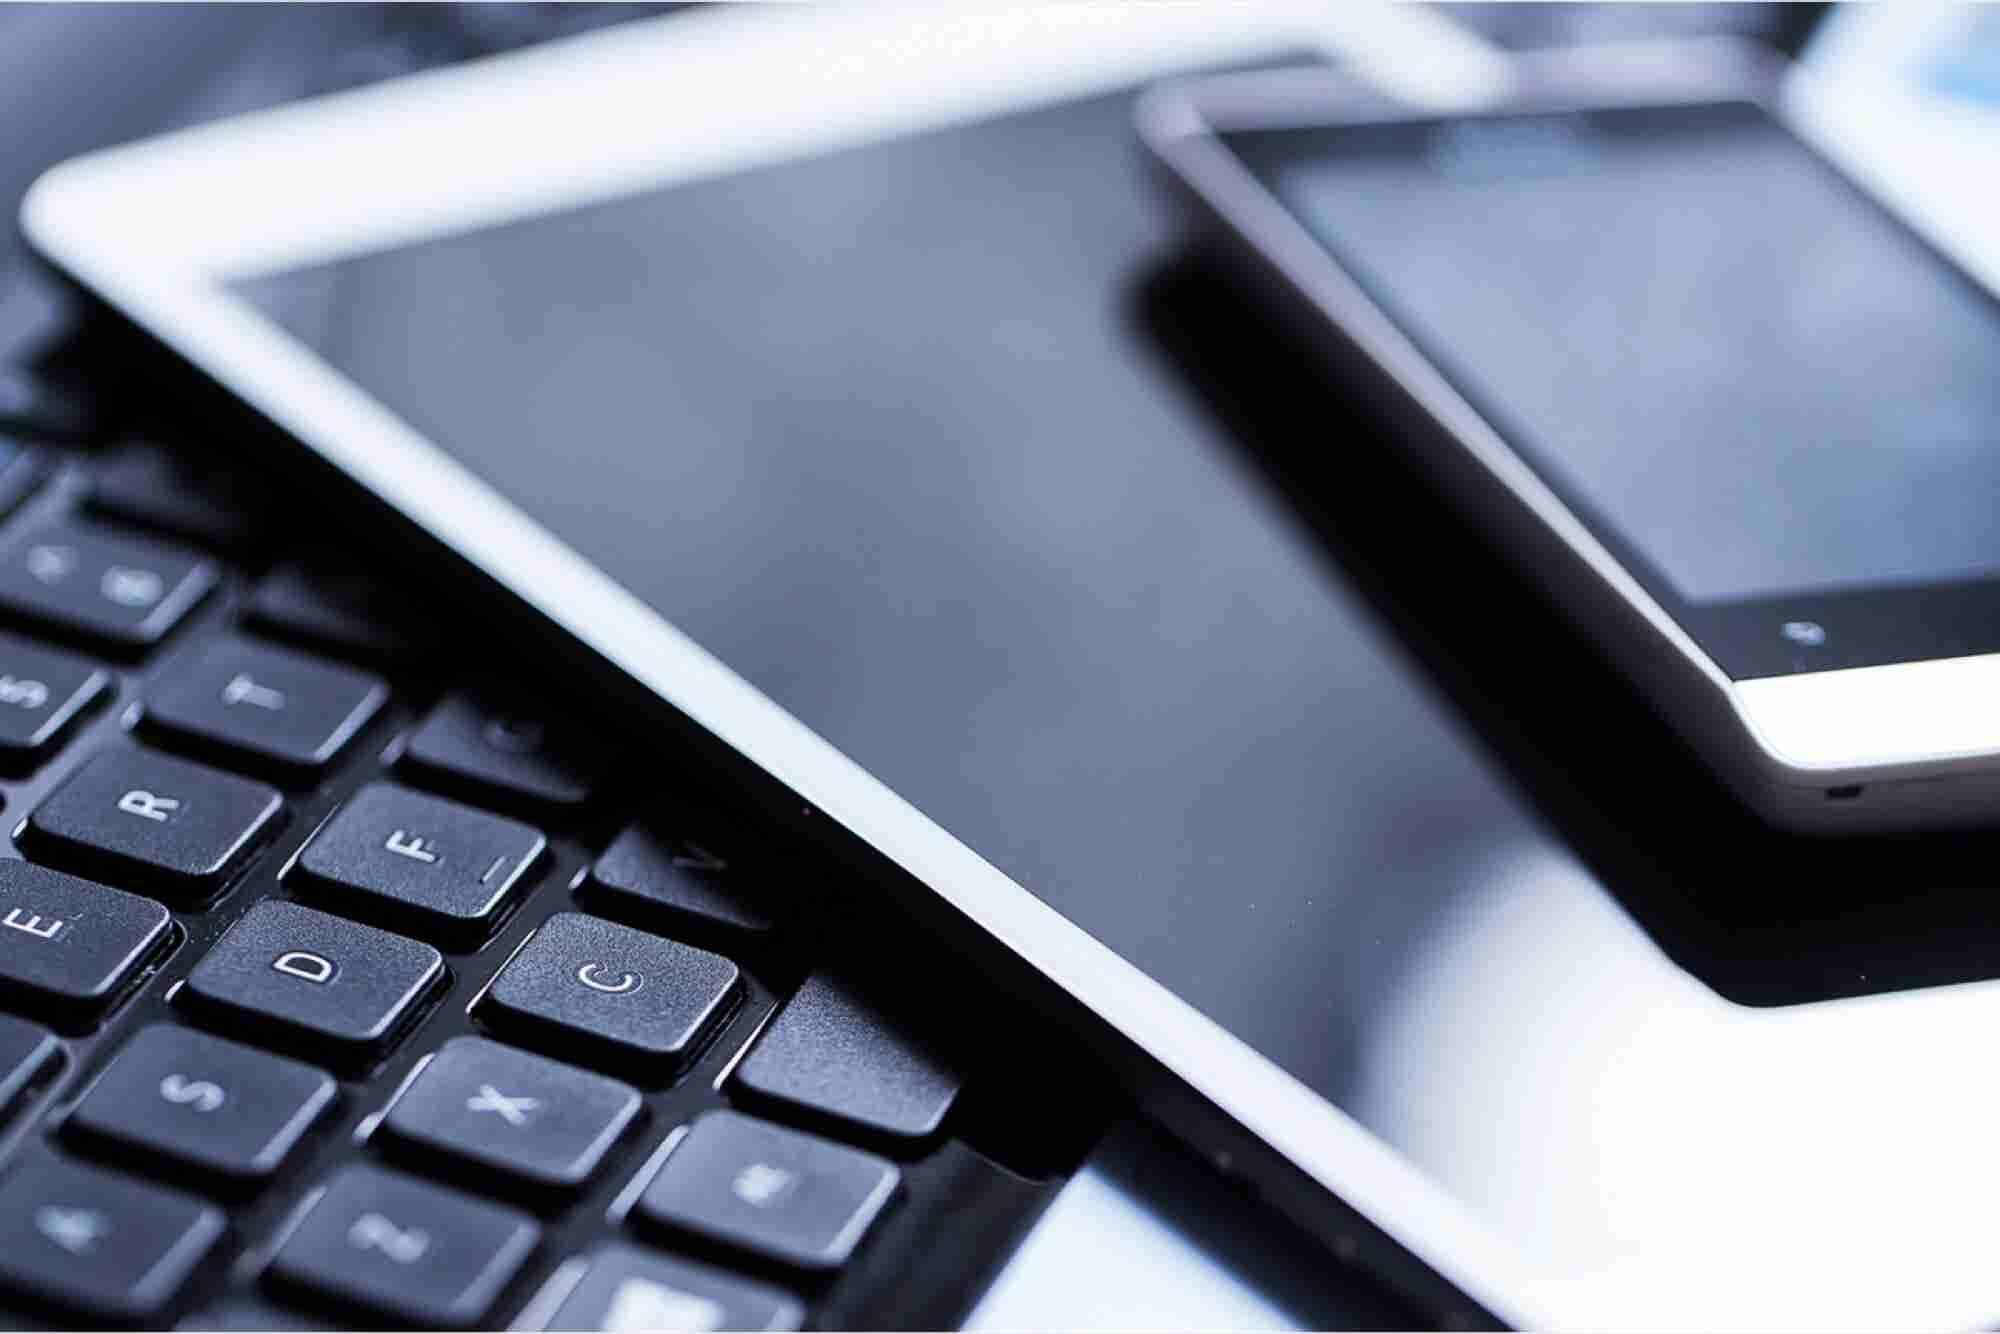 6 New Tech Upgrades Helpful for Entrepreneurs